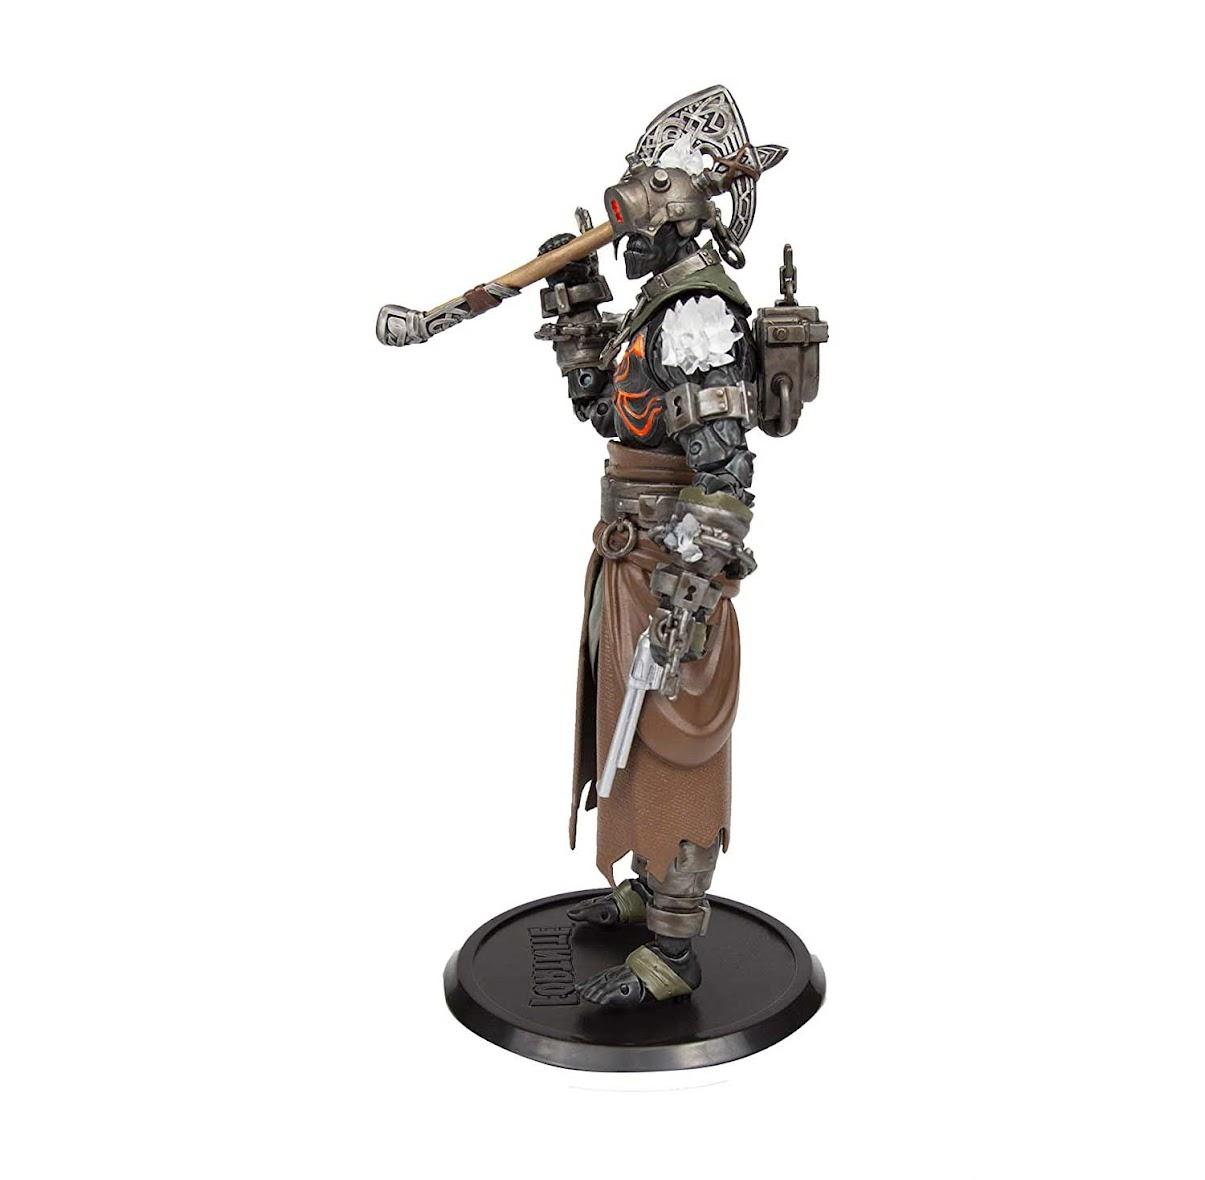 McFarlane premium action figure from Fortnite Prisoner